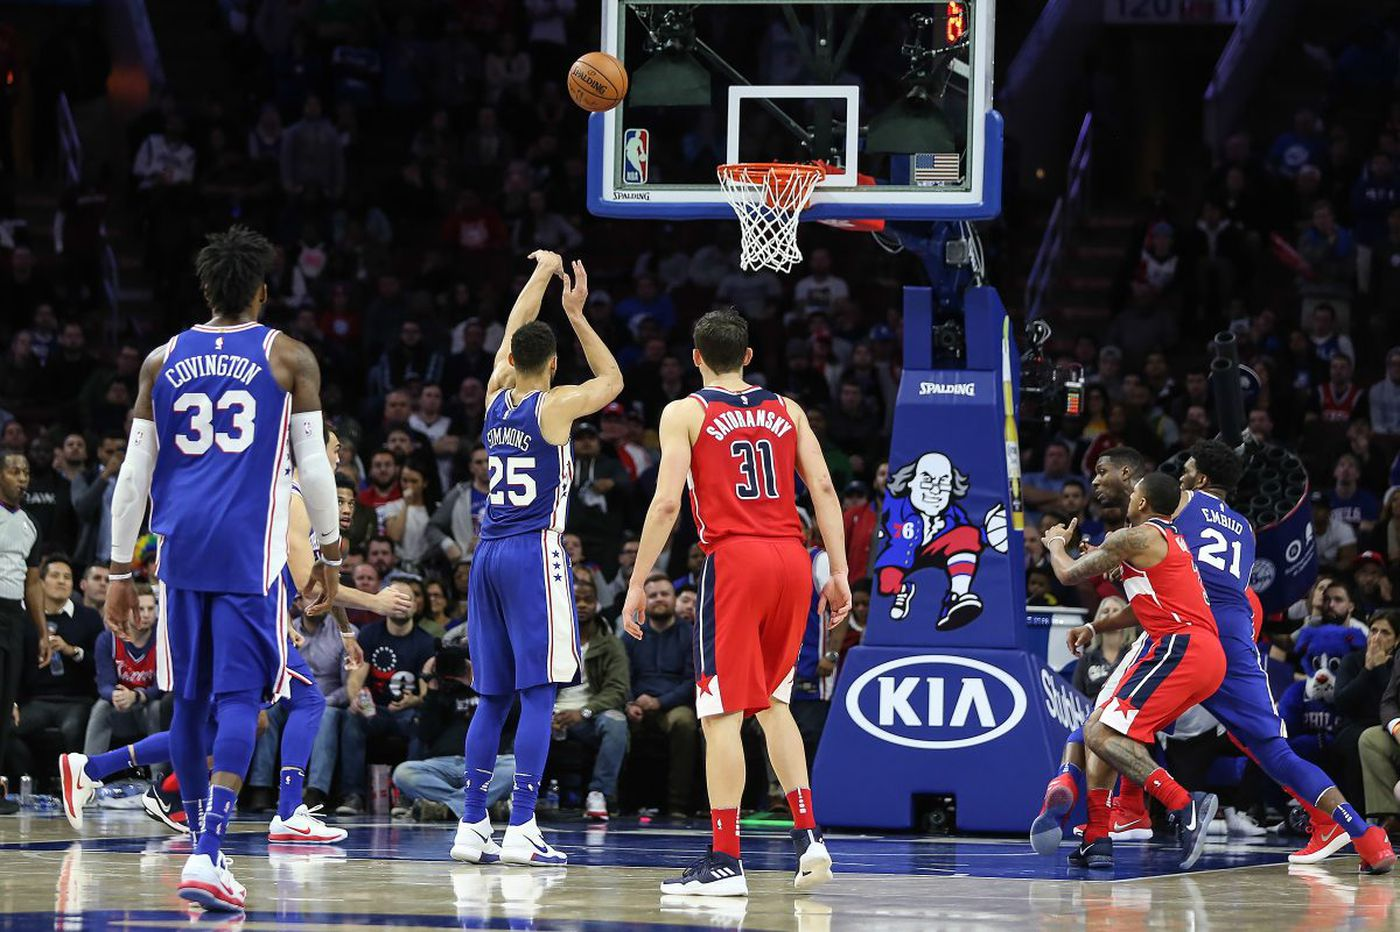 Ben Simmons, Markelle Fultz and the Sixers' shooting slump   David Murphy